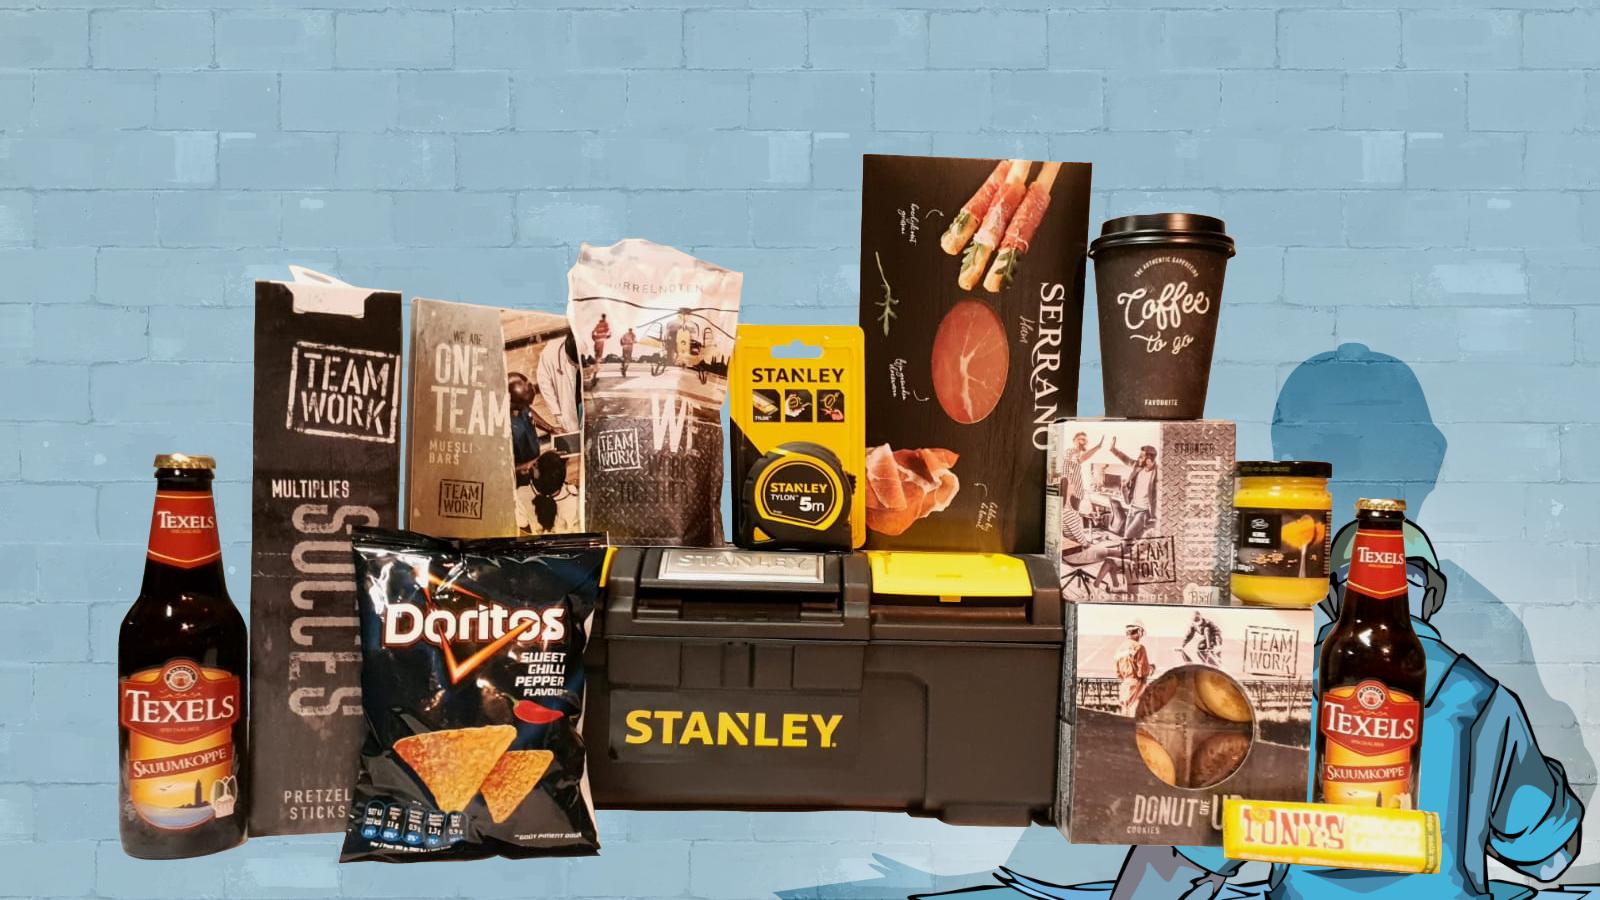 Stanley gereedschapskoffer kerstpakket